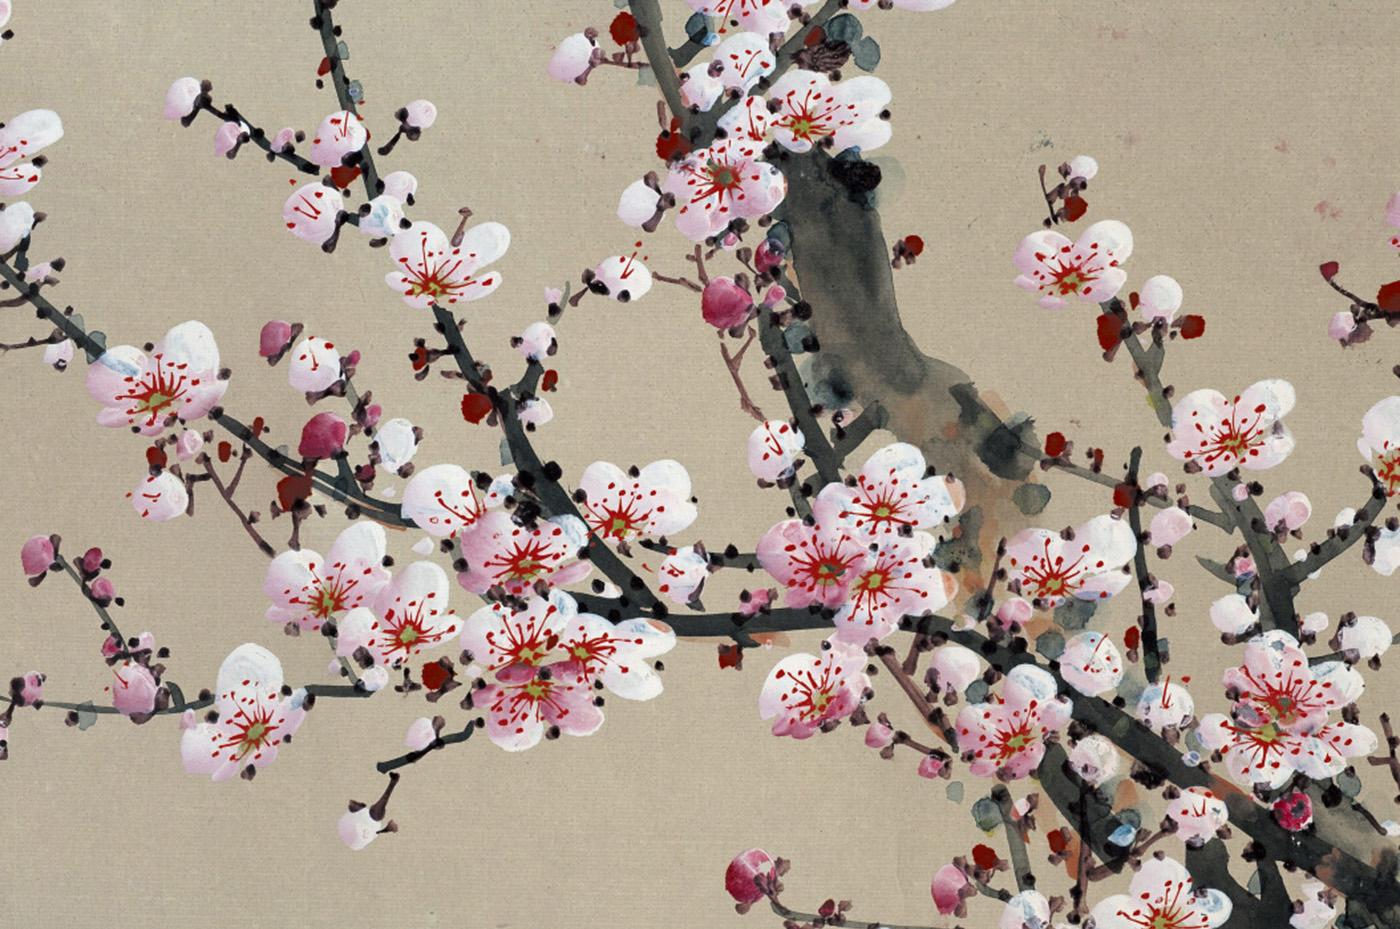 Tableau Cerisier En Fleur Idee D Image De Fleur